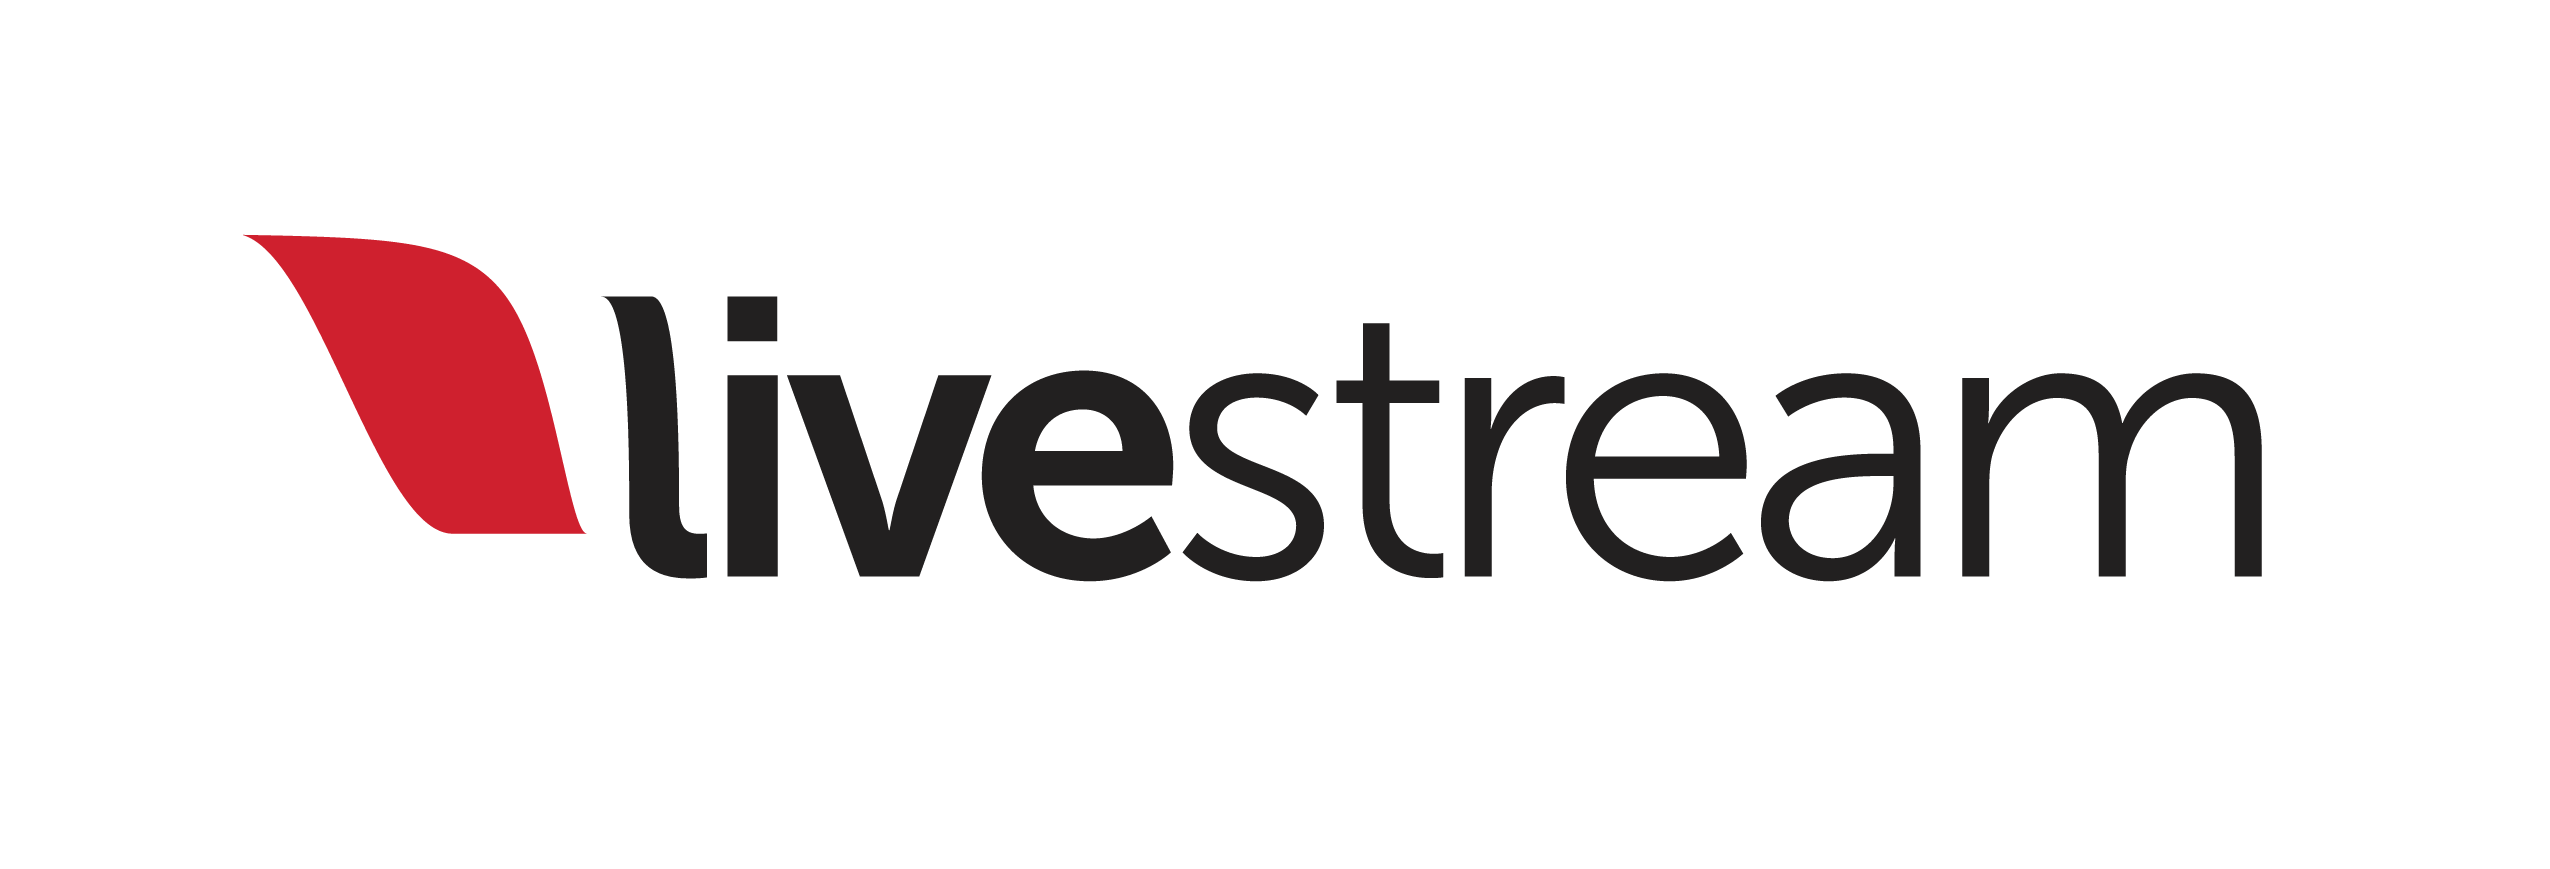 livestream wikipedia